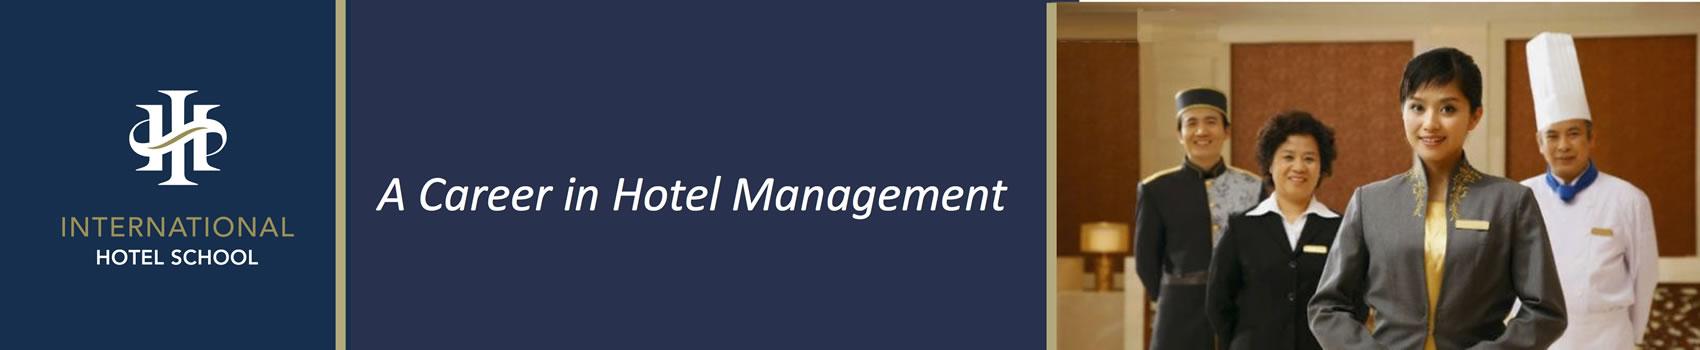 International Hotel School